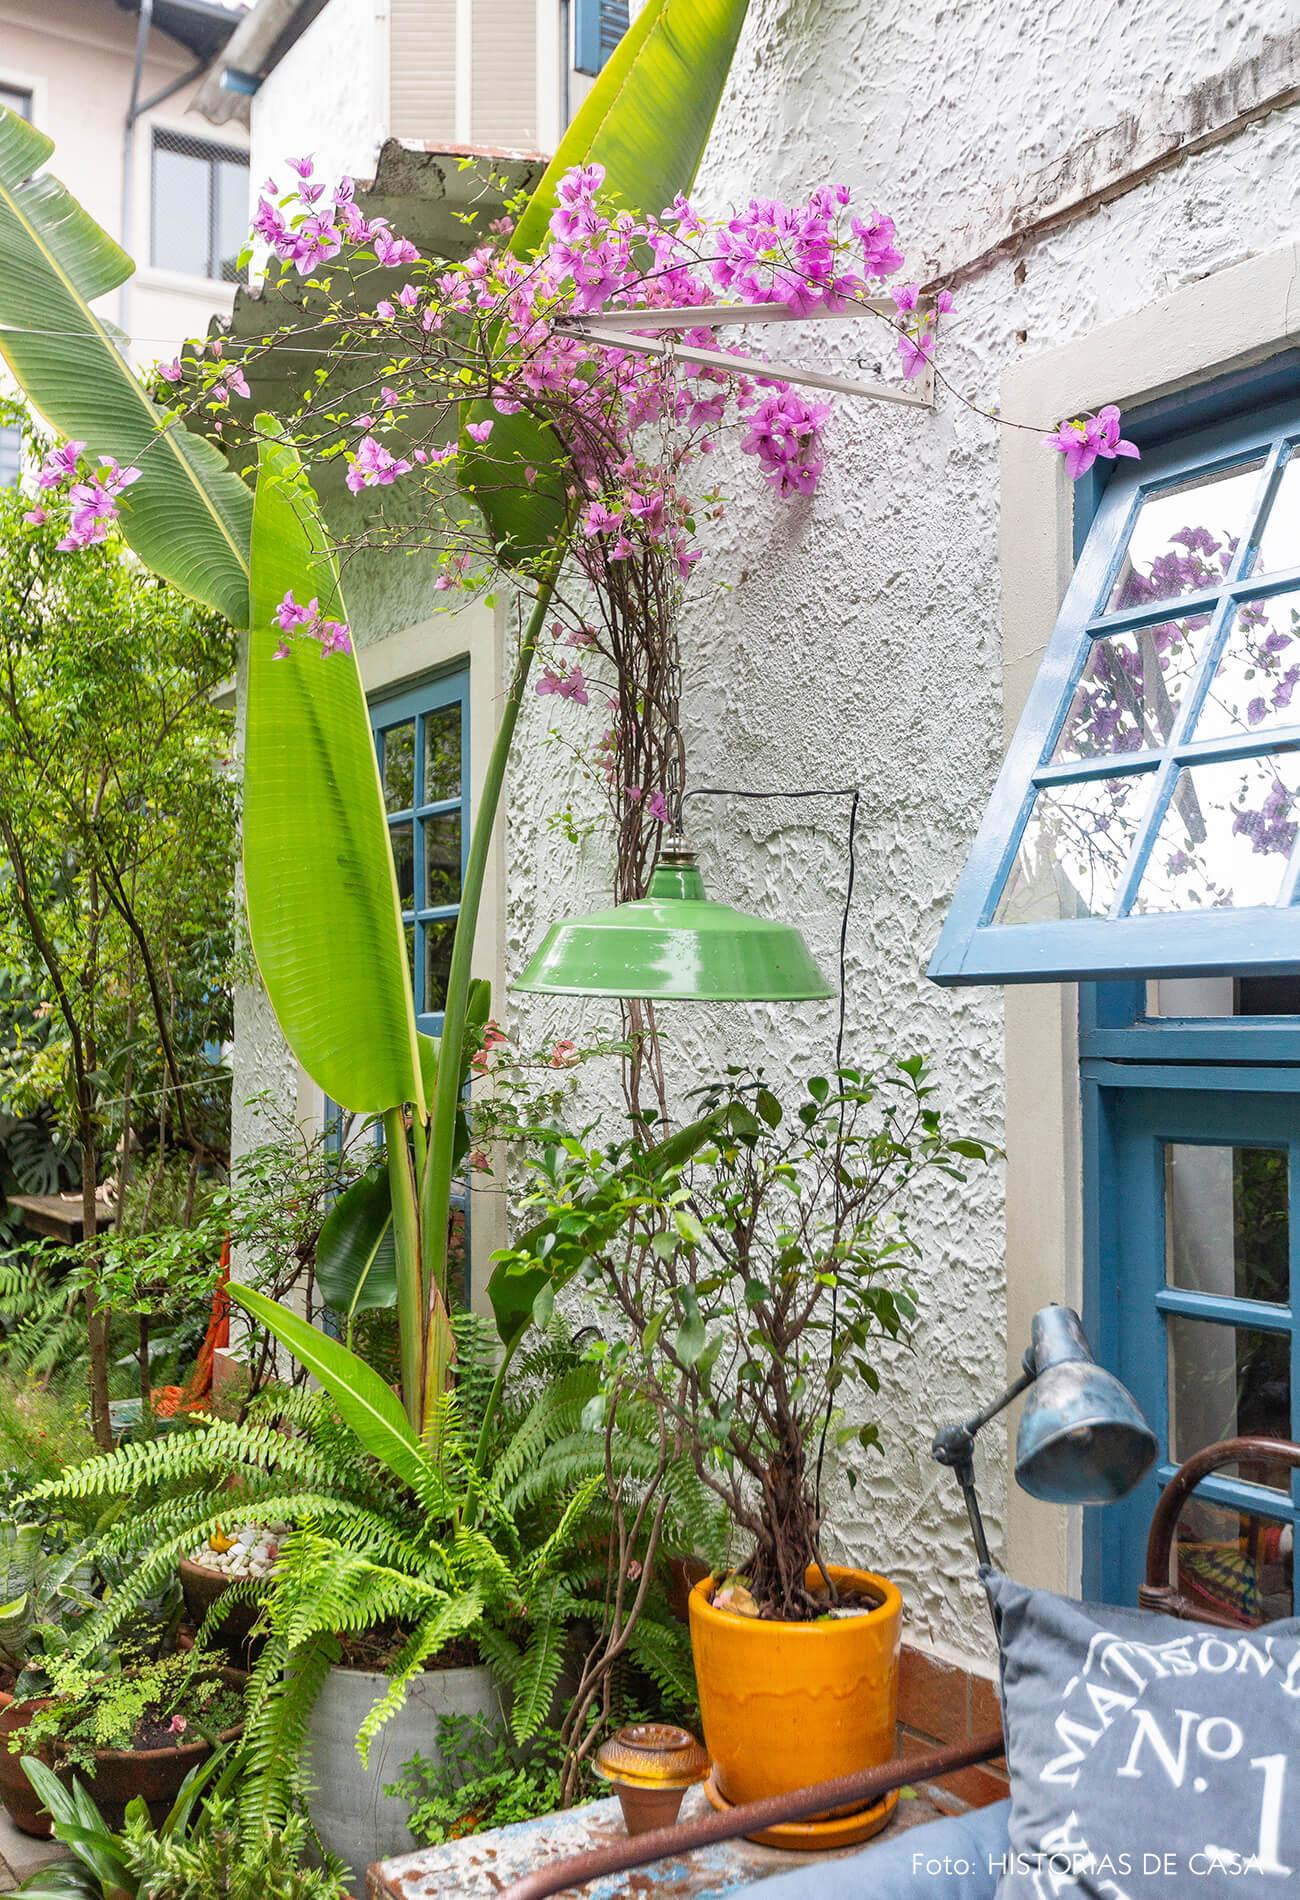 Jardim com primavera e abajur antigo